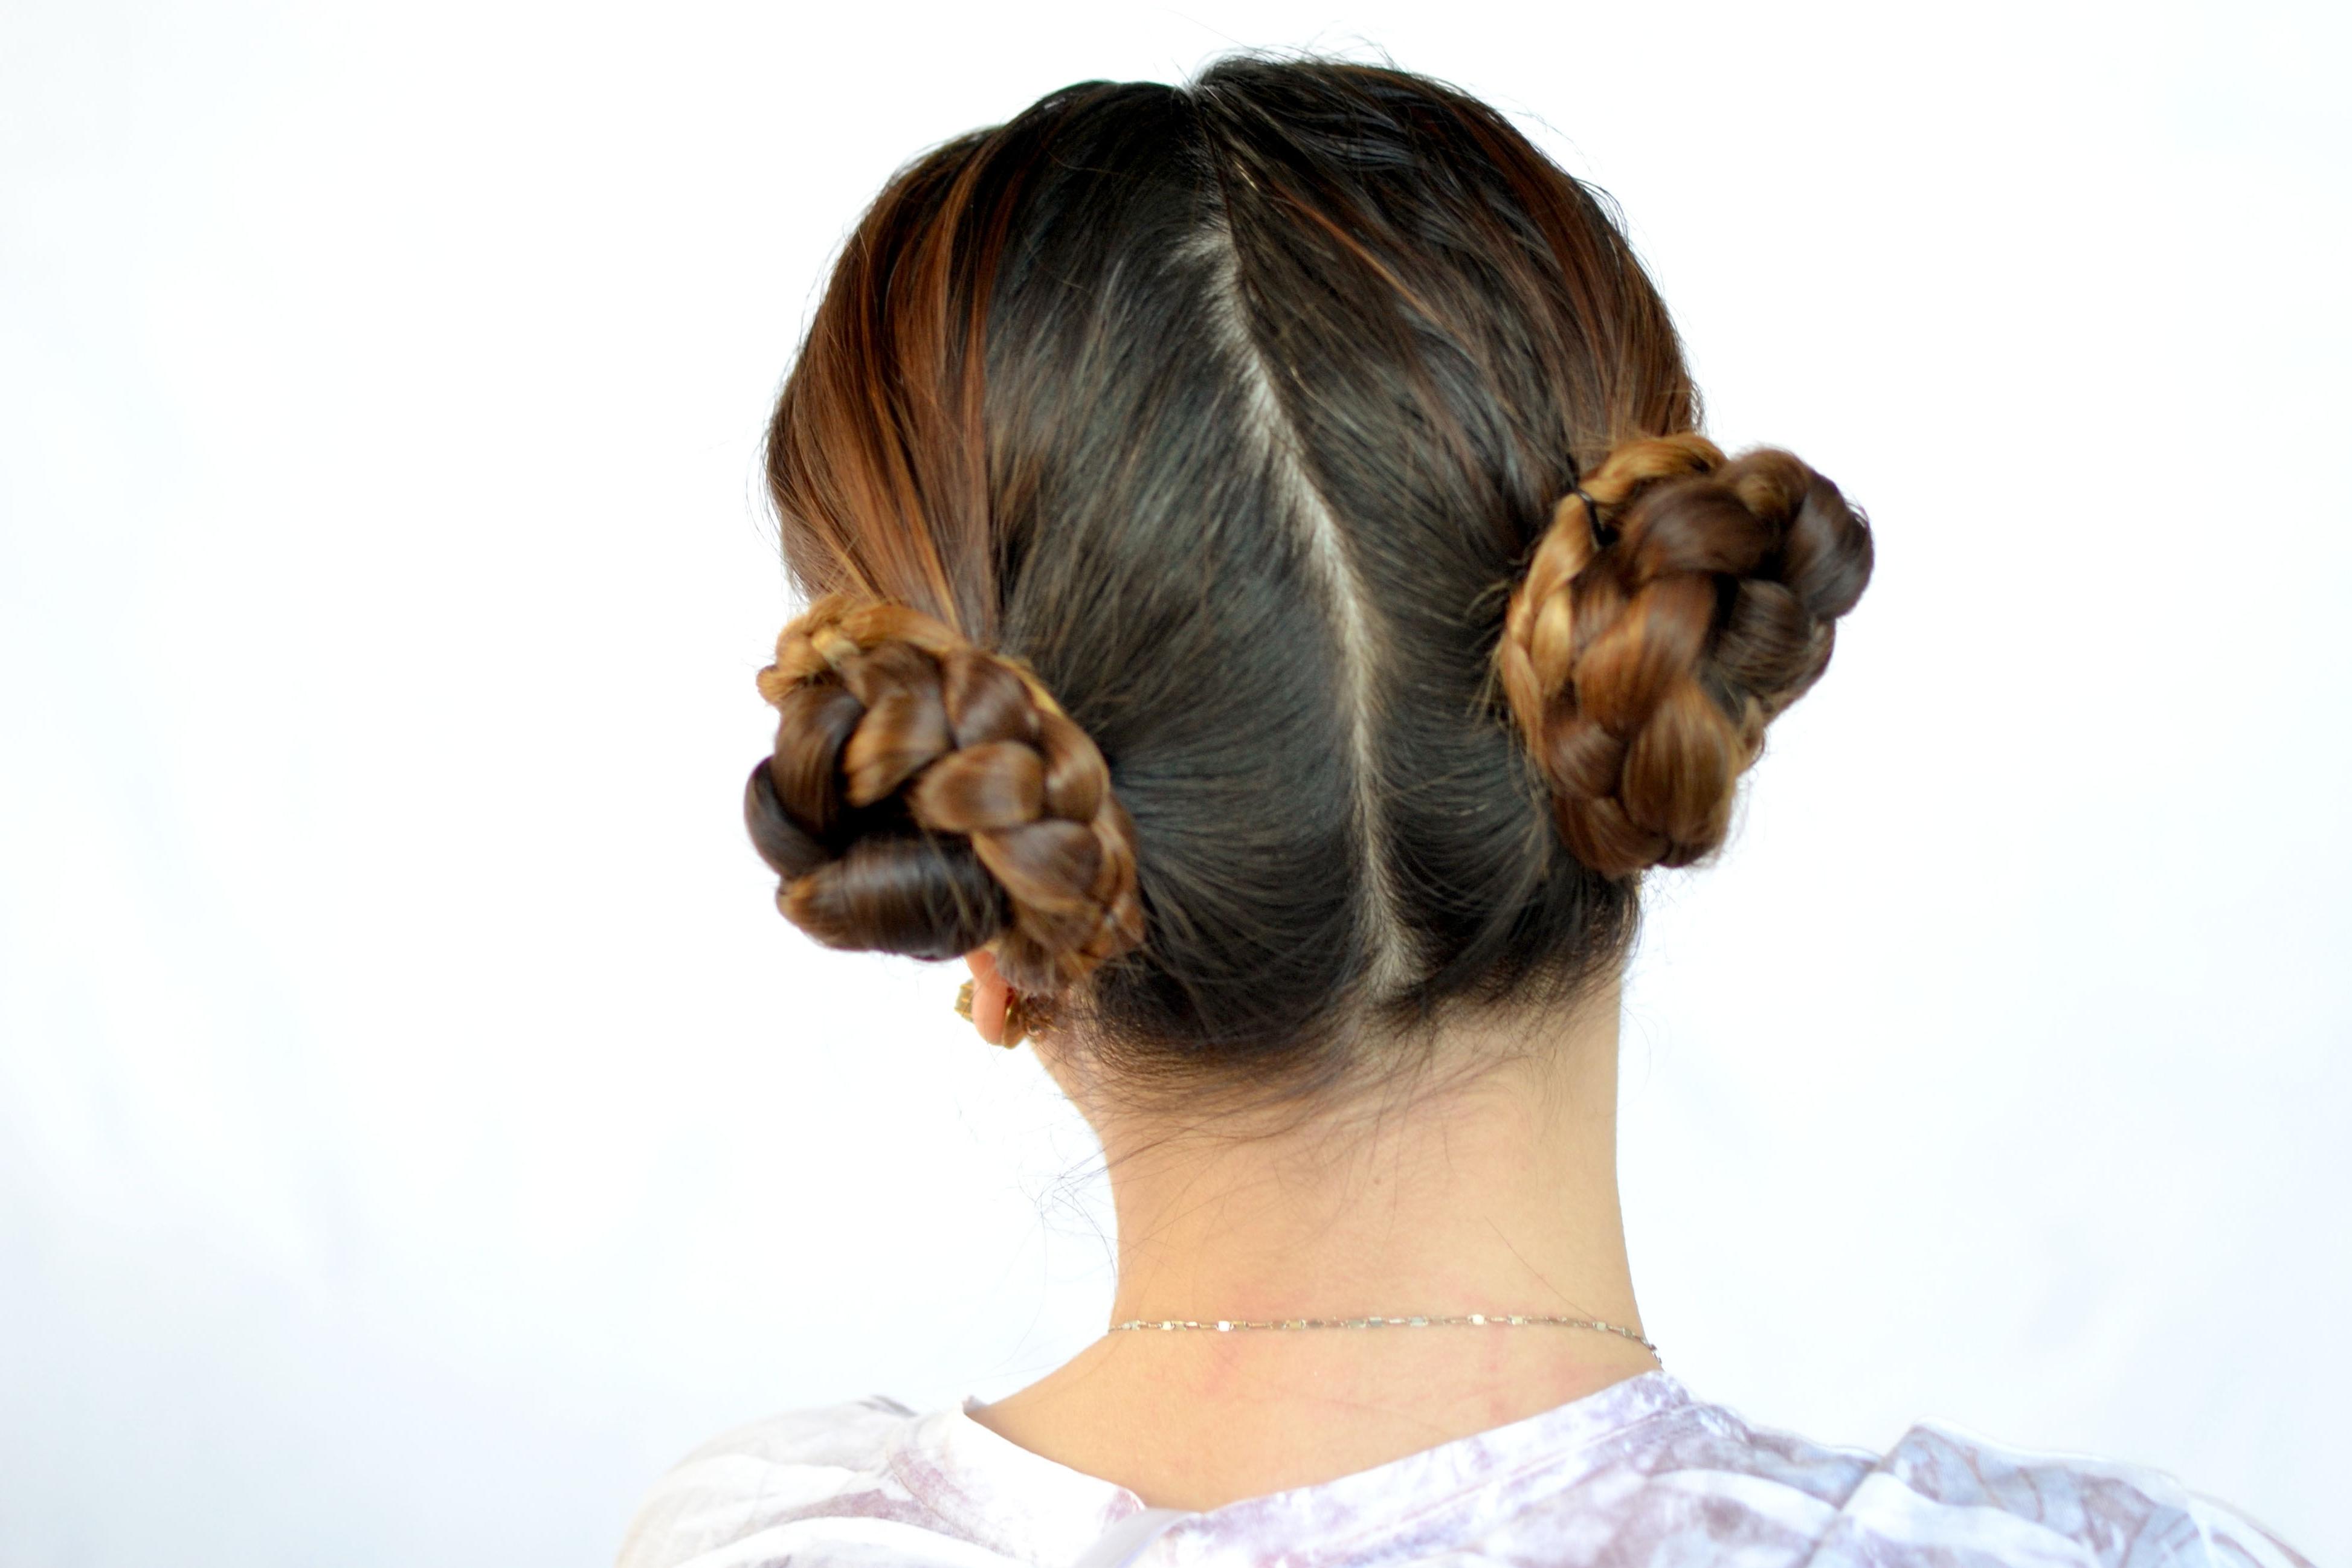 3 Ways To Create A Braided Cinnamon Bun Hairstyle – Wikihow Regarding Popular Braid And Bun Hairstyles (View 3 of 15)